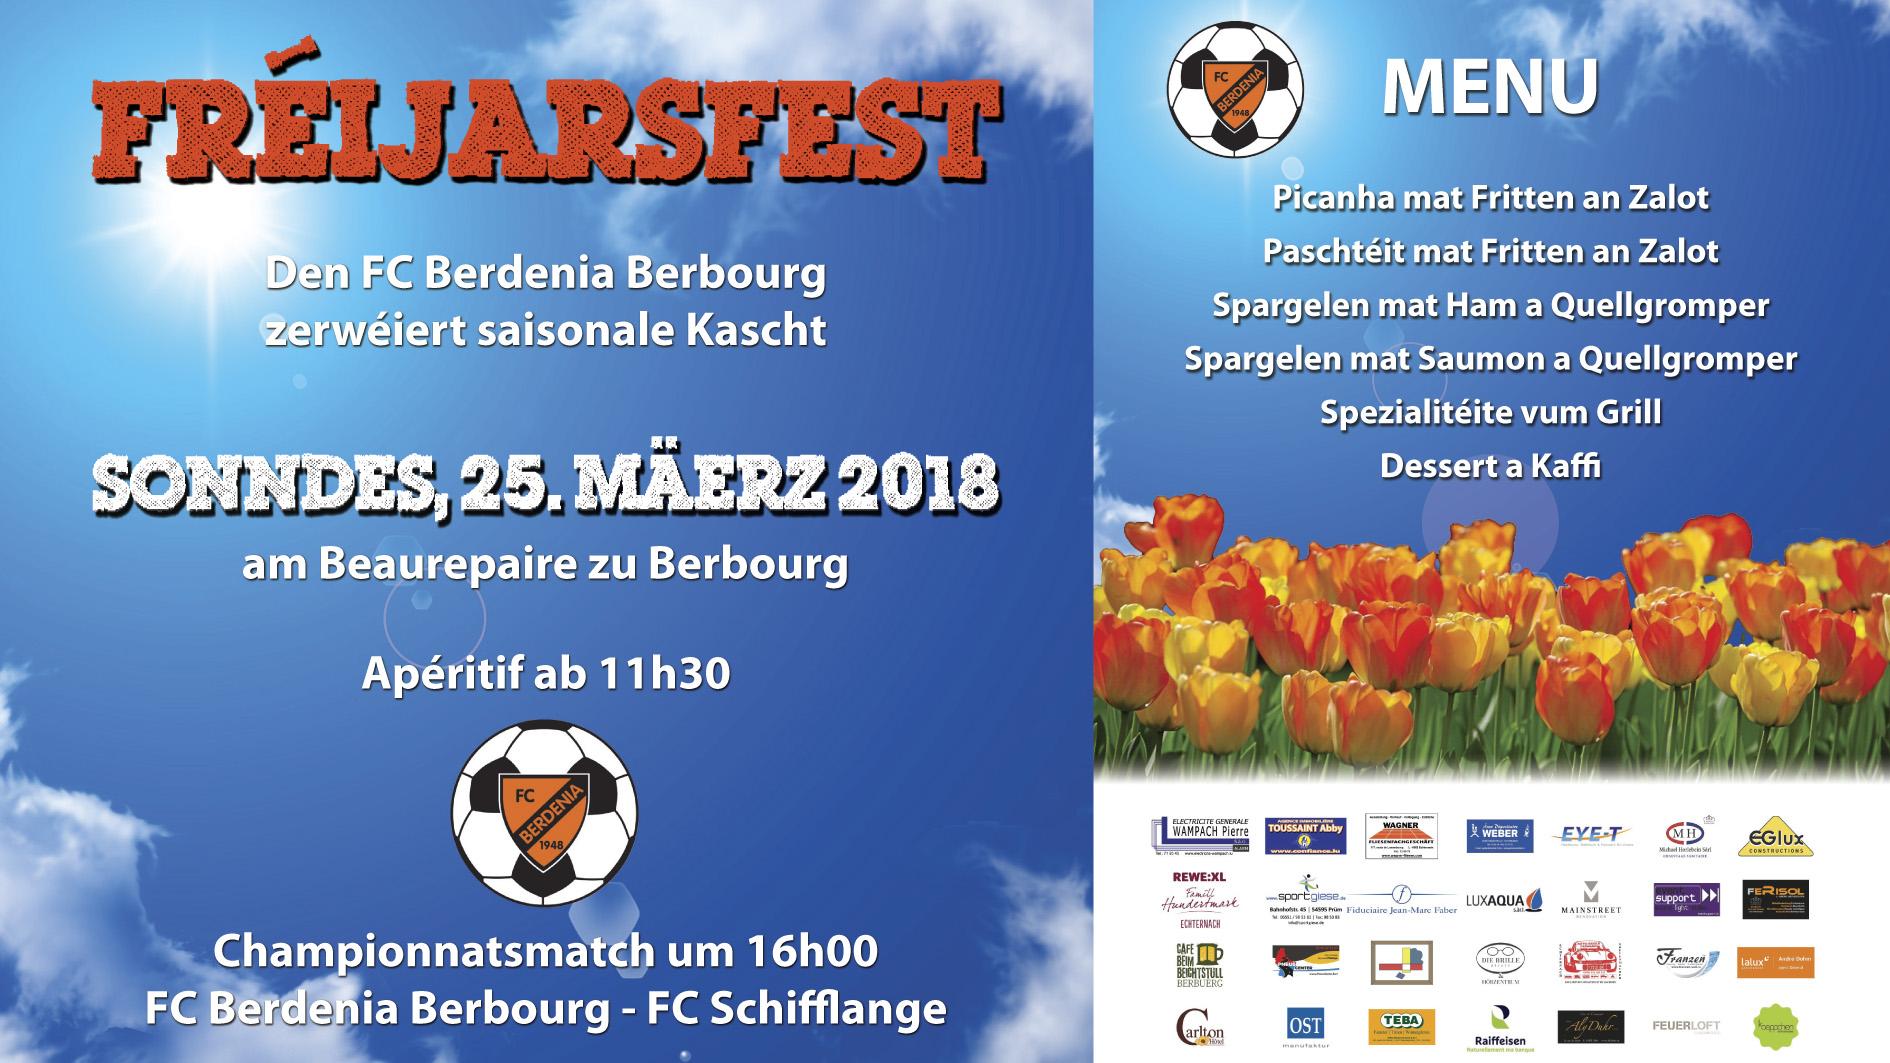 Fréijarsfest 2018